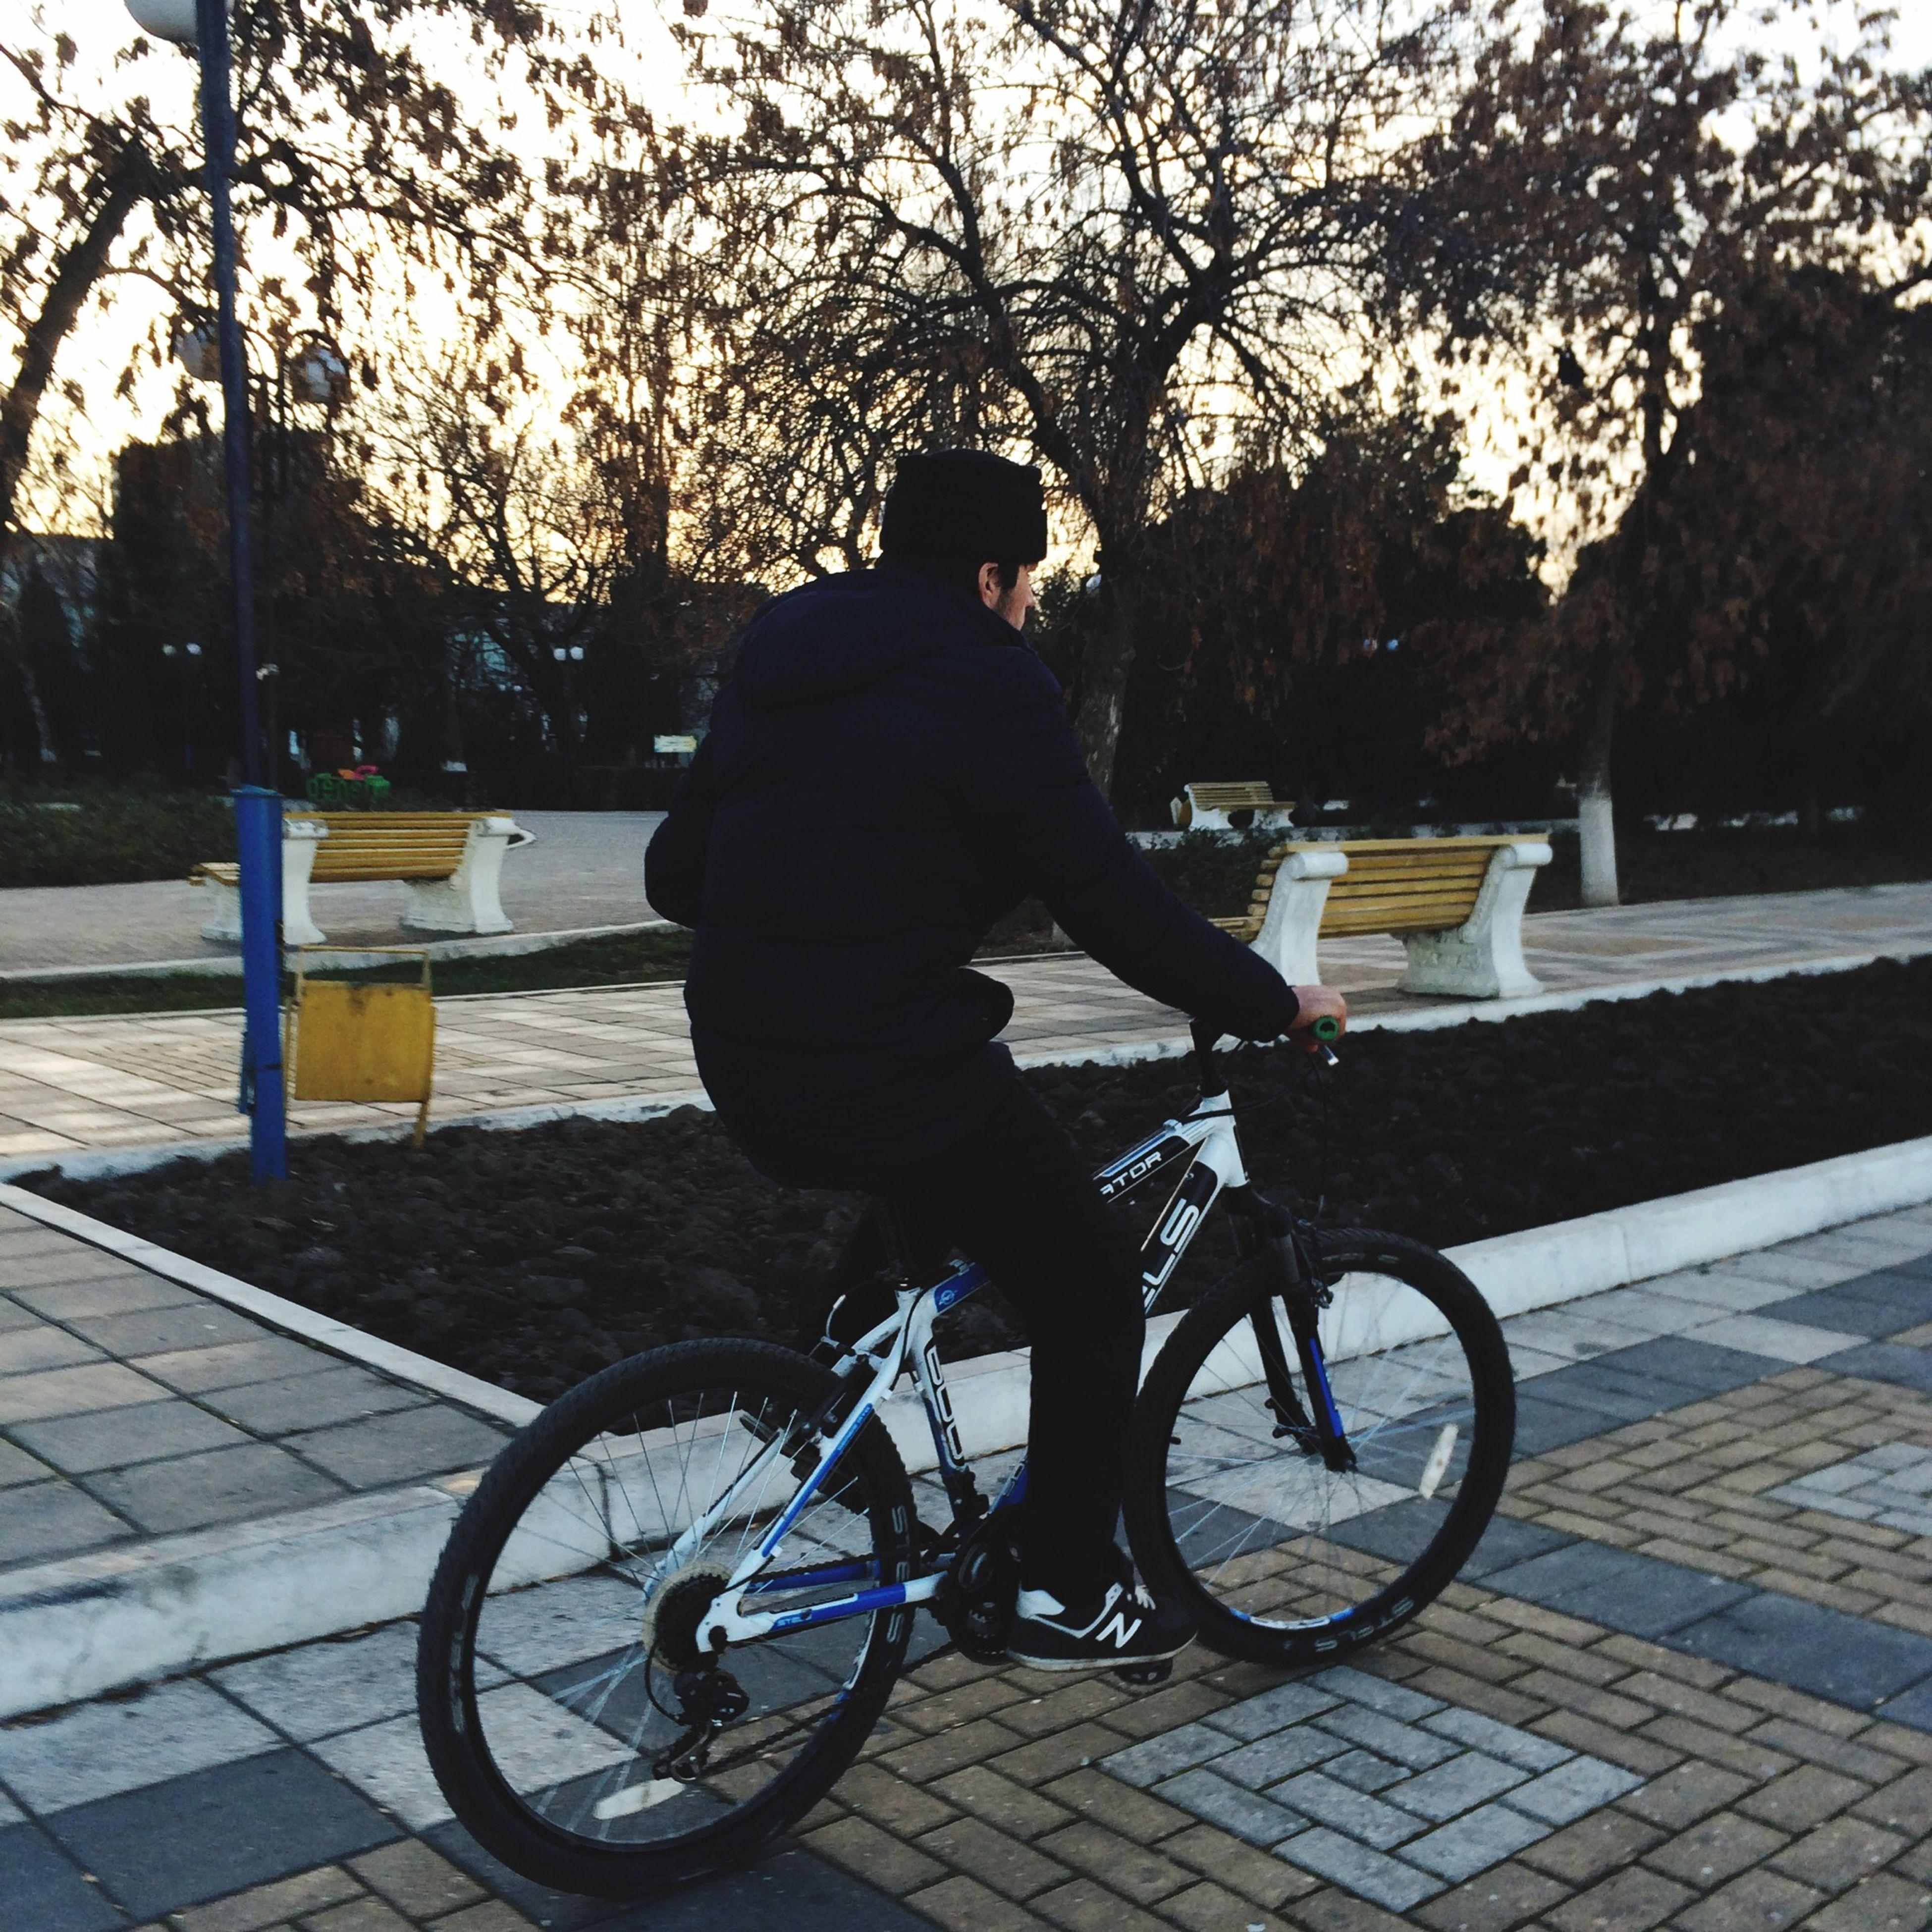 tree, bicycle, lifestyles, transportation, sidewalk, leisure activity, street, full length, mode of transport, footpath, bench, shadow, sunlight, land vehicle, men, city, railing, park - man made space